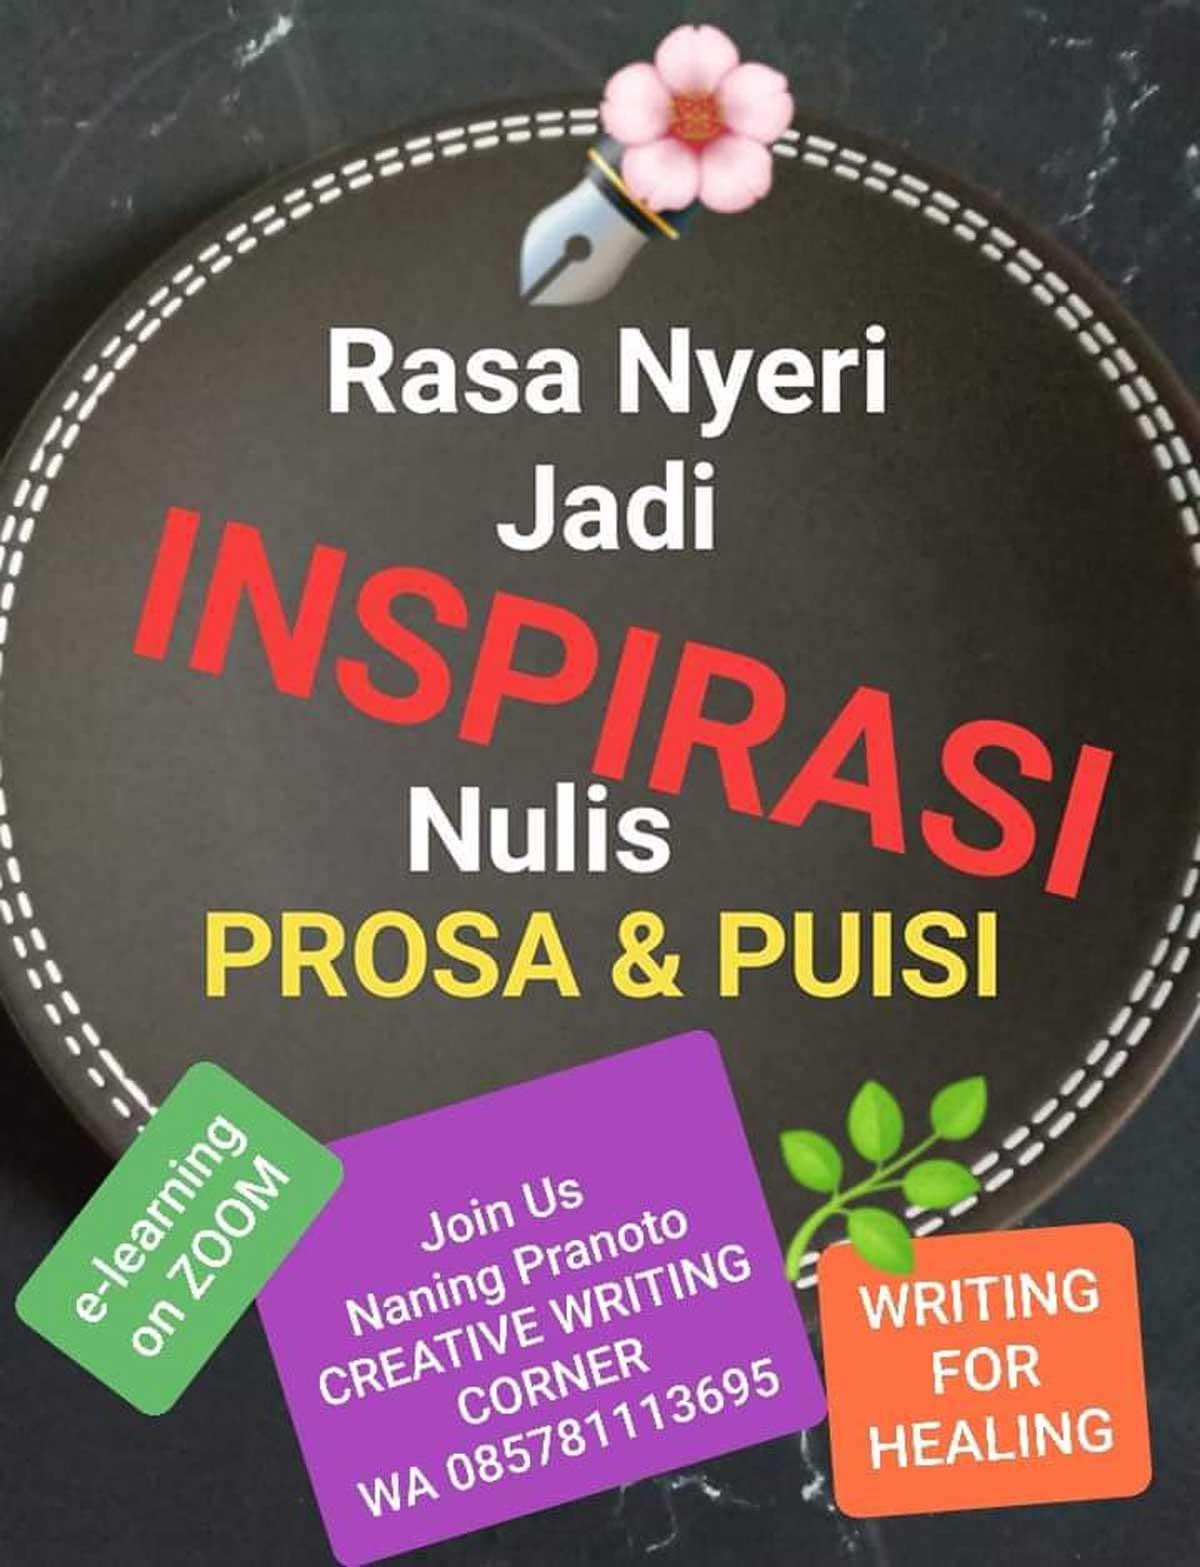 Inspirasi Nulis Puisi dan Prosa